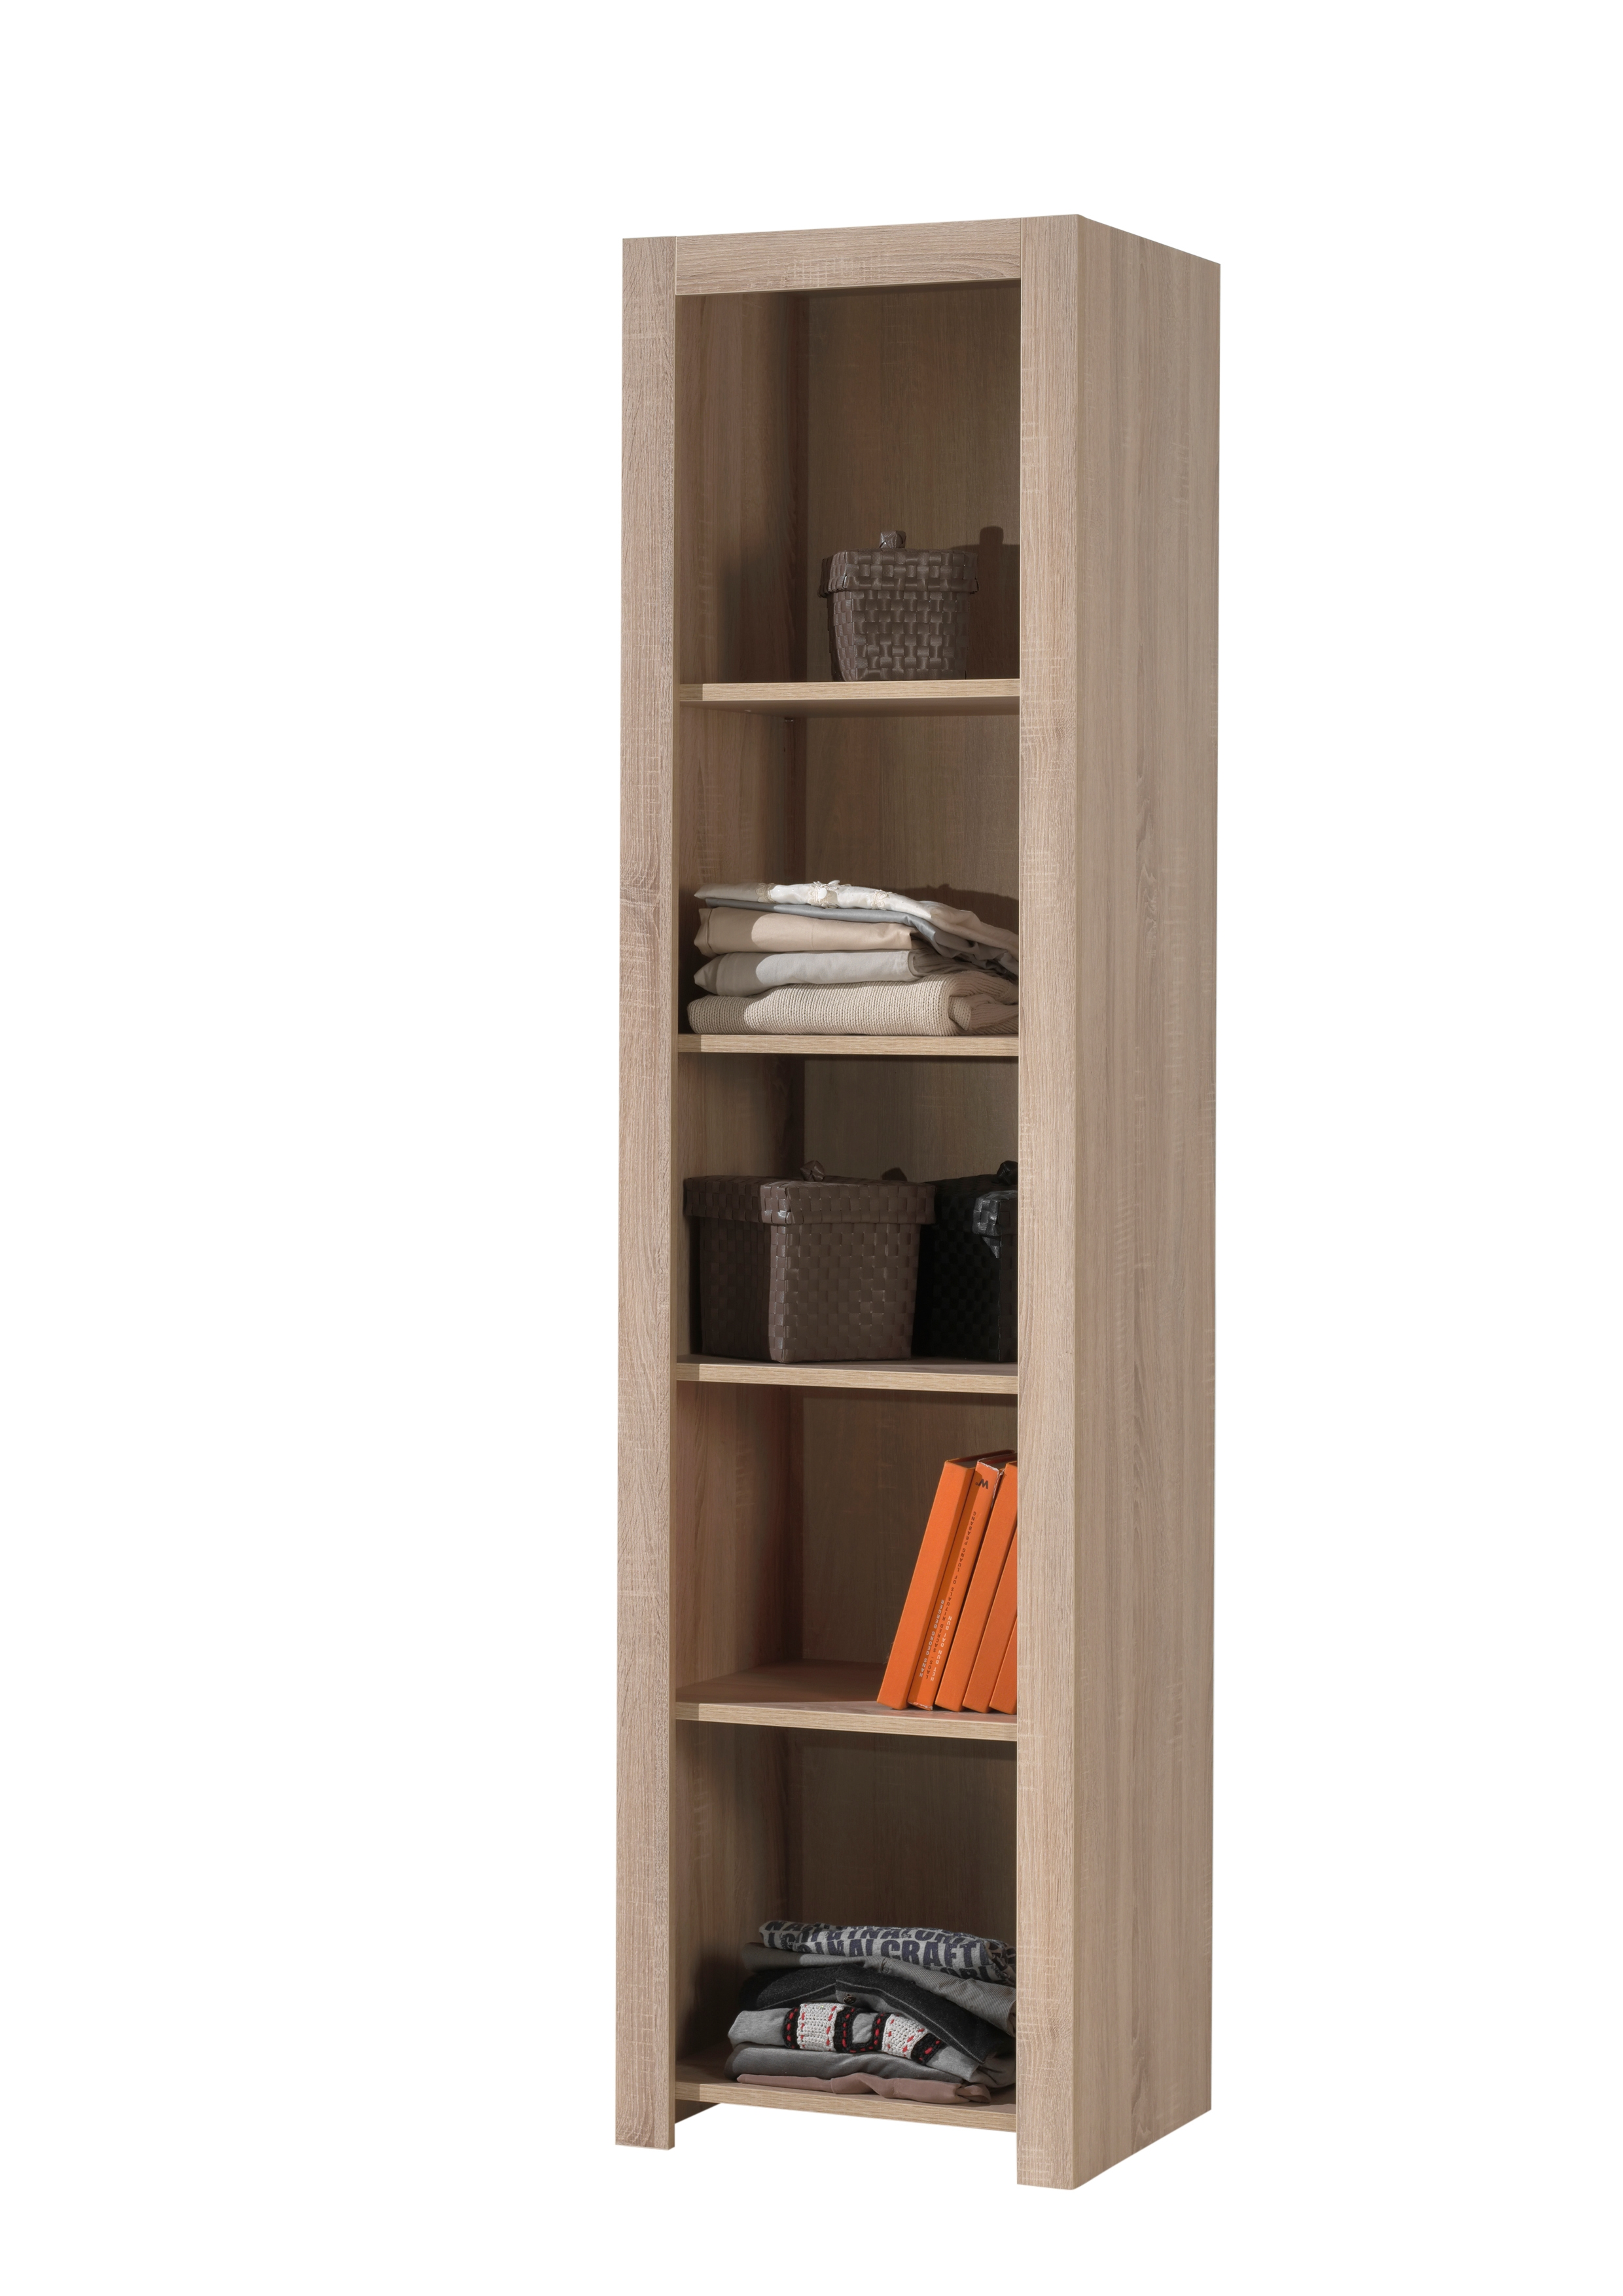 Biblioteca din pal pentru copii Aline Stejar deschis, l50,2xA45xH198,8 cm imagine